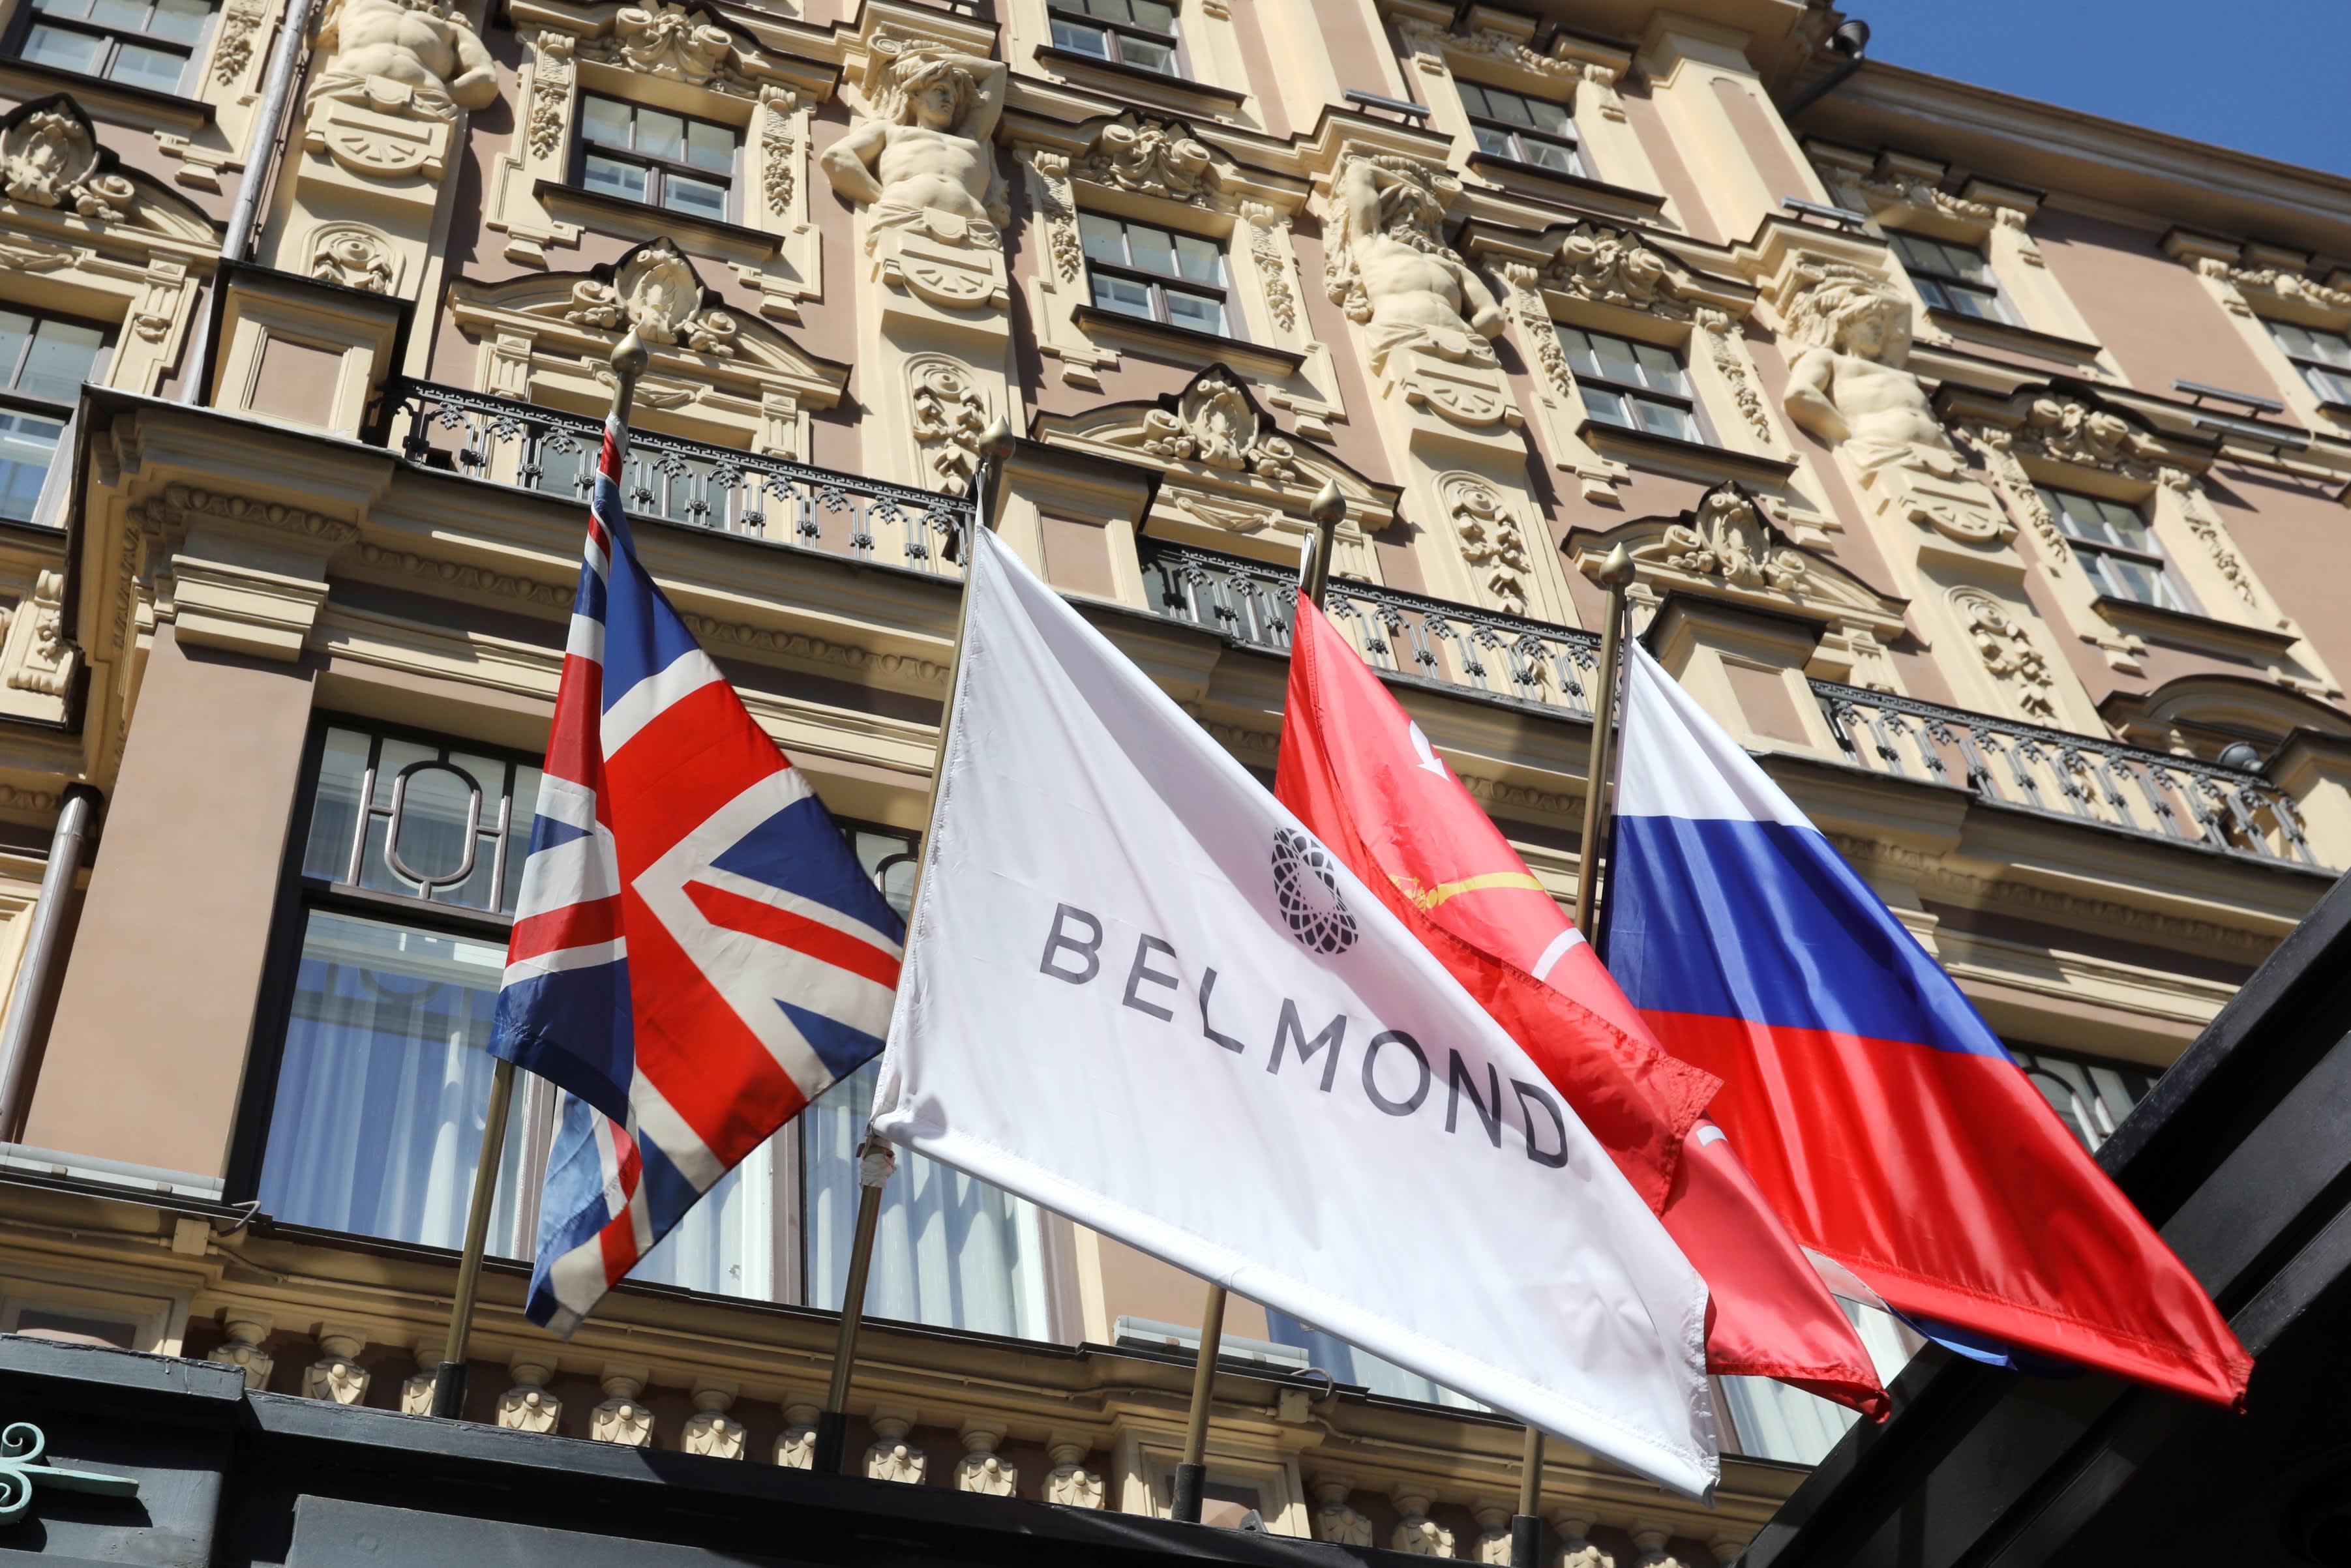 5a266a532c3 LVMH to buy Belmond luxury hotel group for $3.2 billion